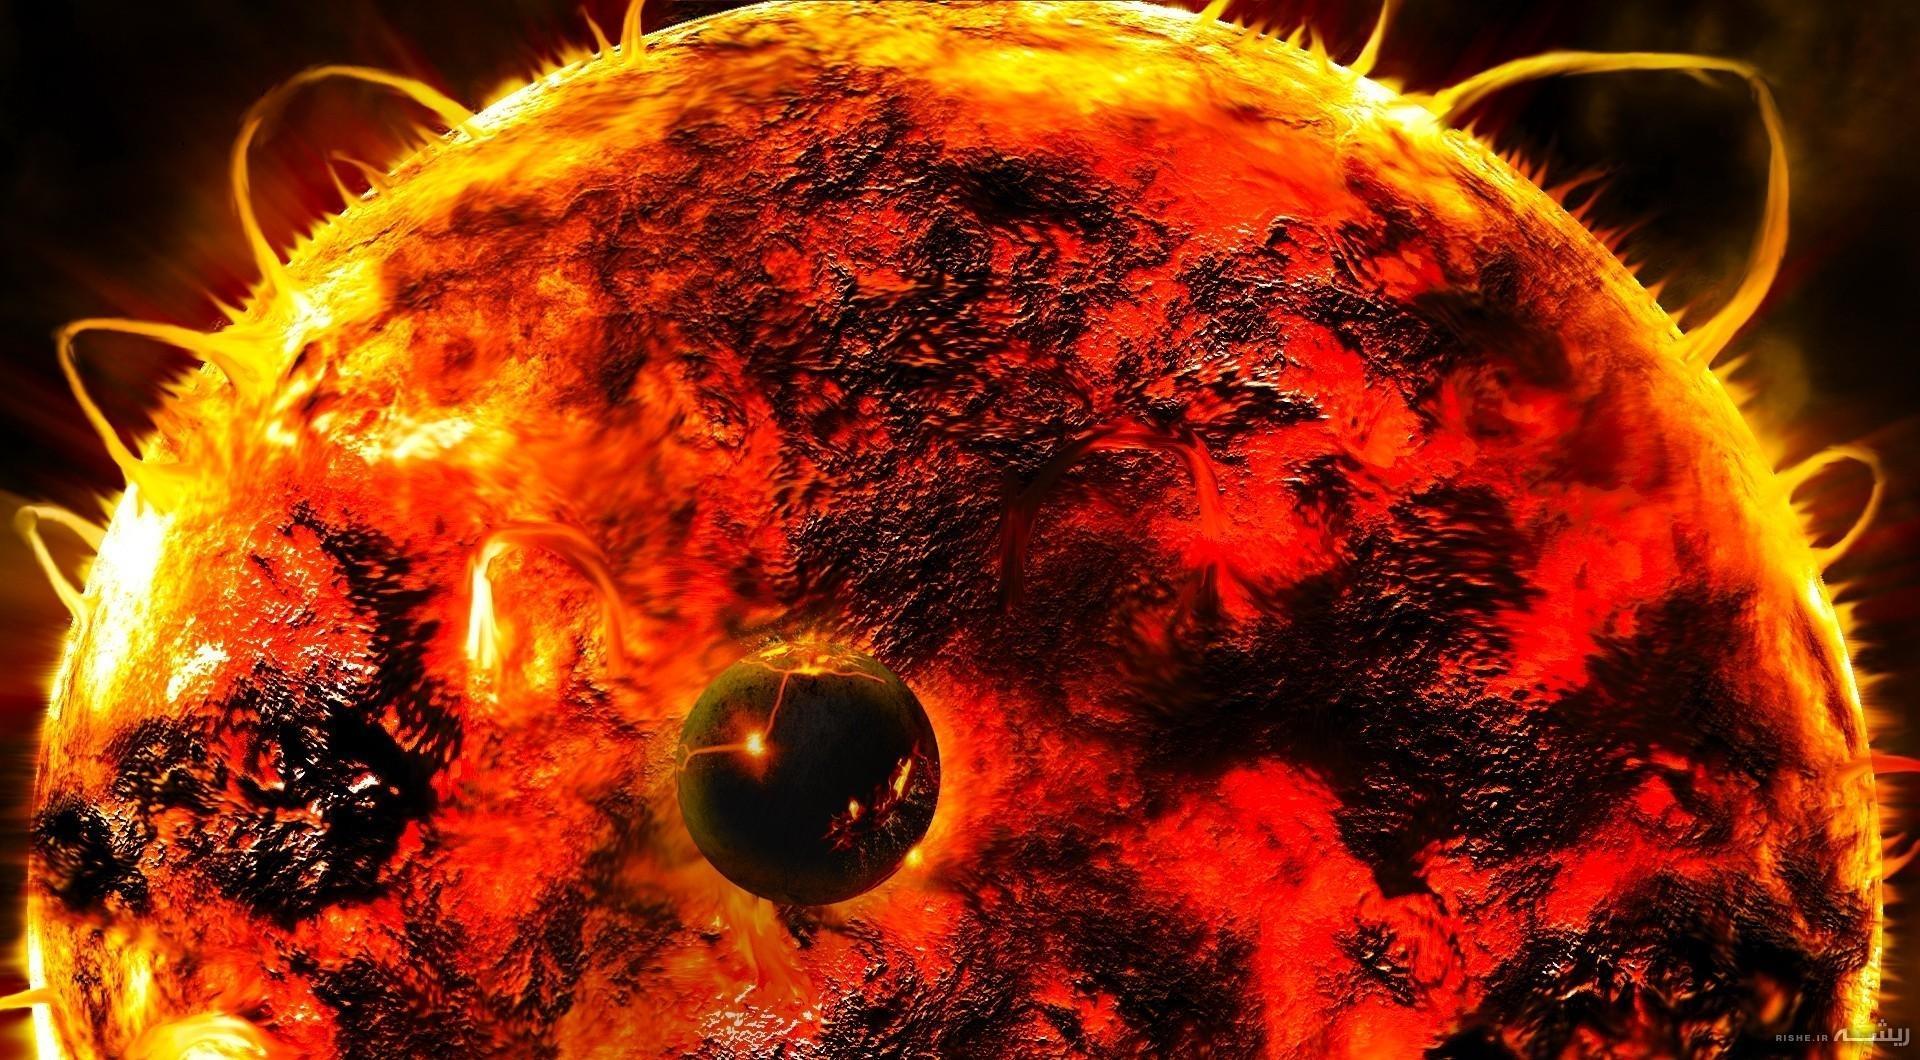 چرا چین خورشید مصنوعی میسازد؟